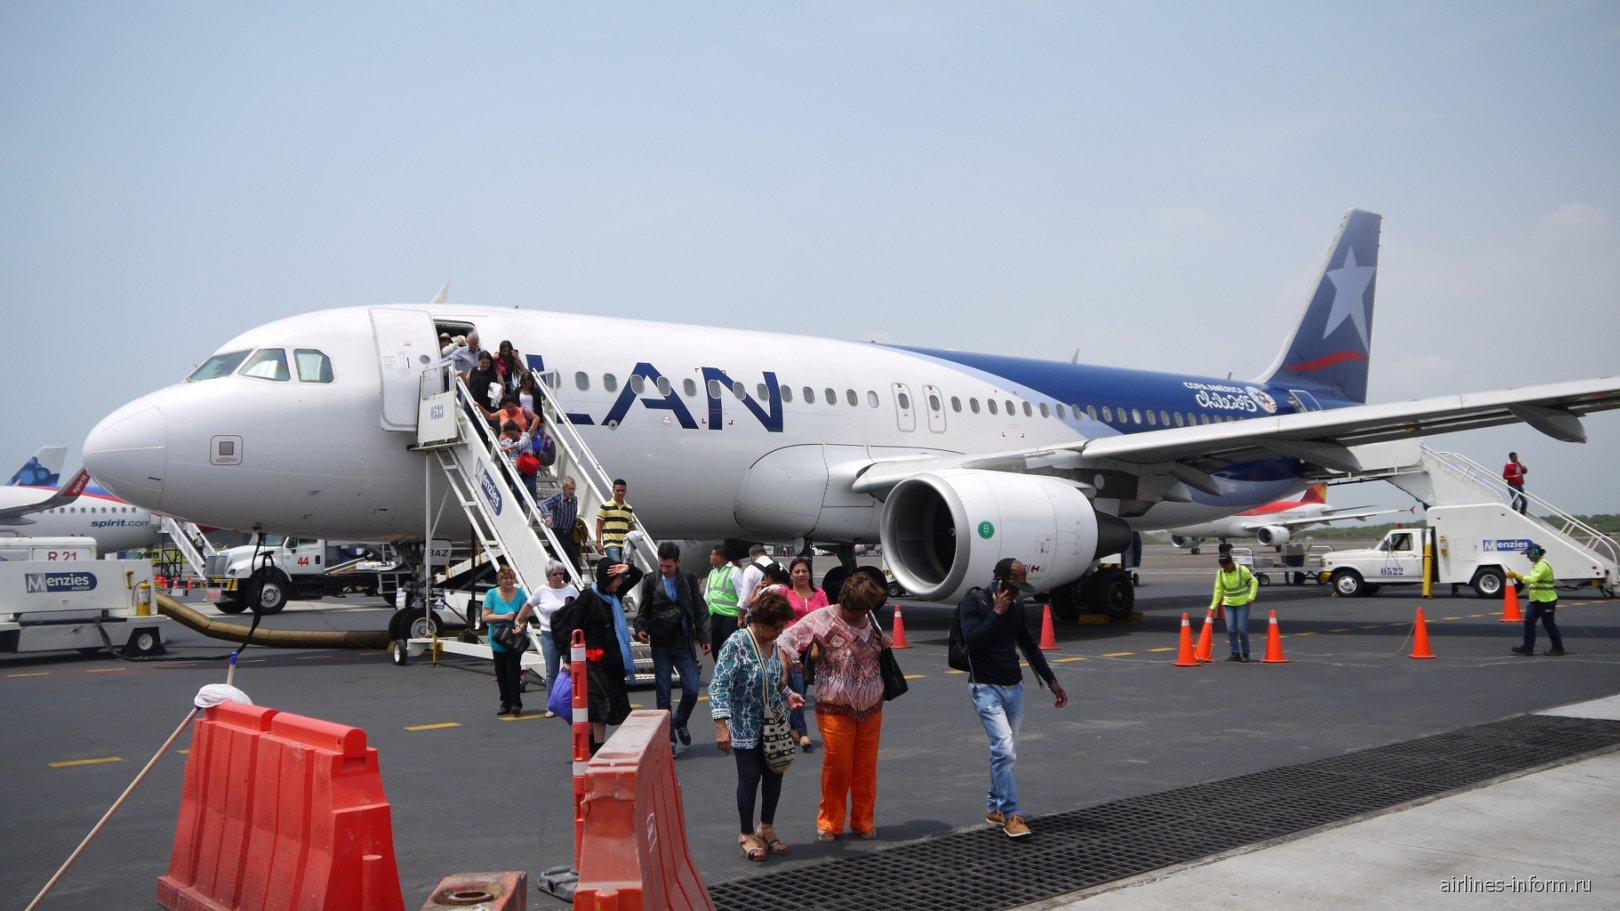 Airbus A320 авиакомпании LAN Colombia в аэропорту Картахены